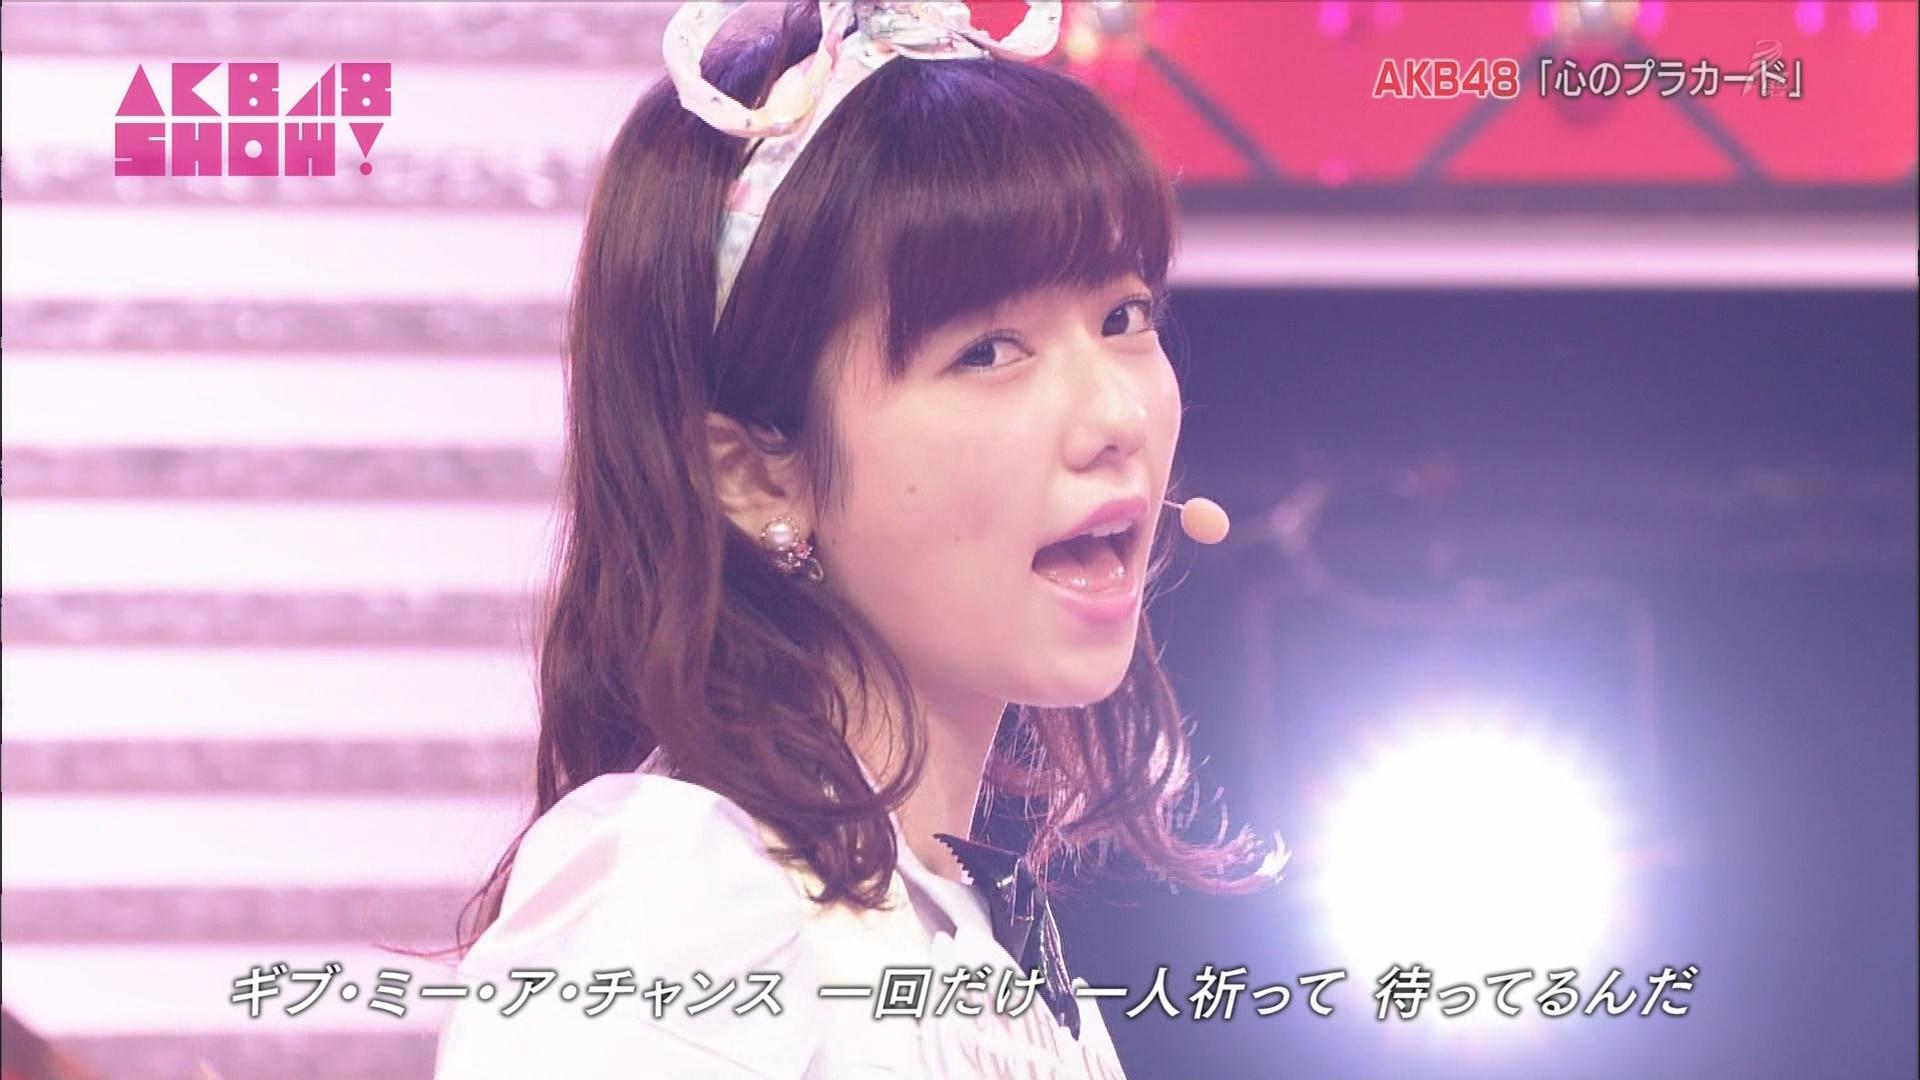 AKB48SHOW 心のプラカード 島崎遥香 20140830 (4)